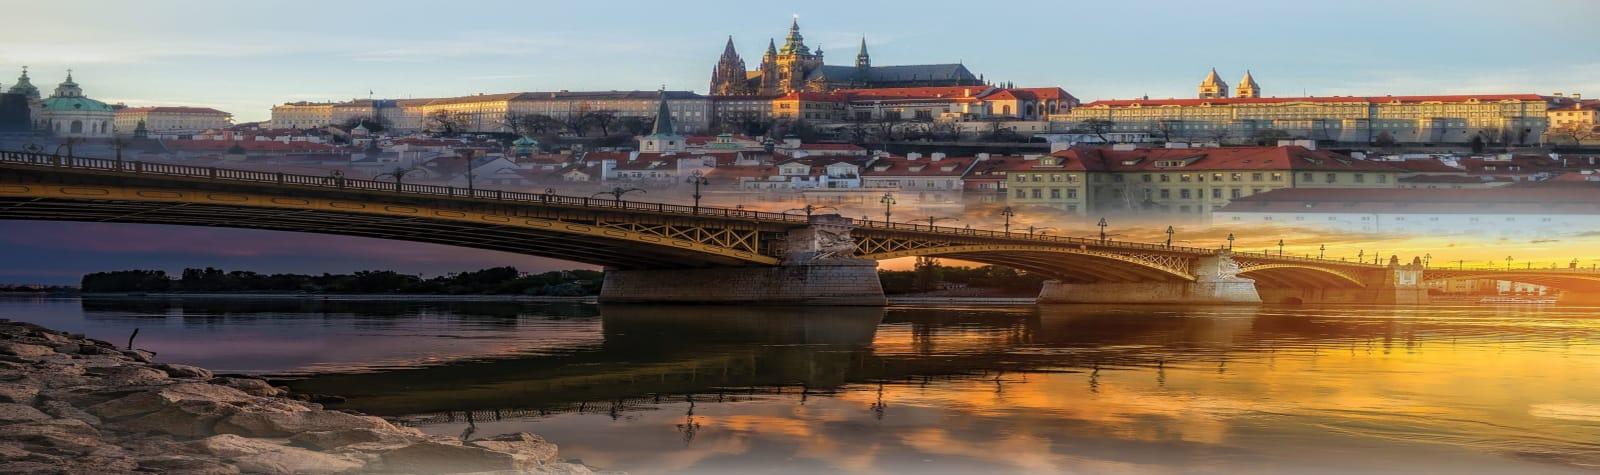 Danube-Cruise_2019.jpg